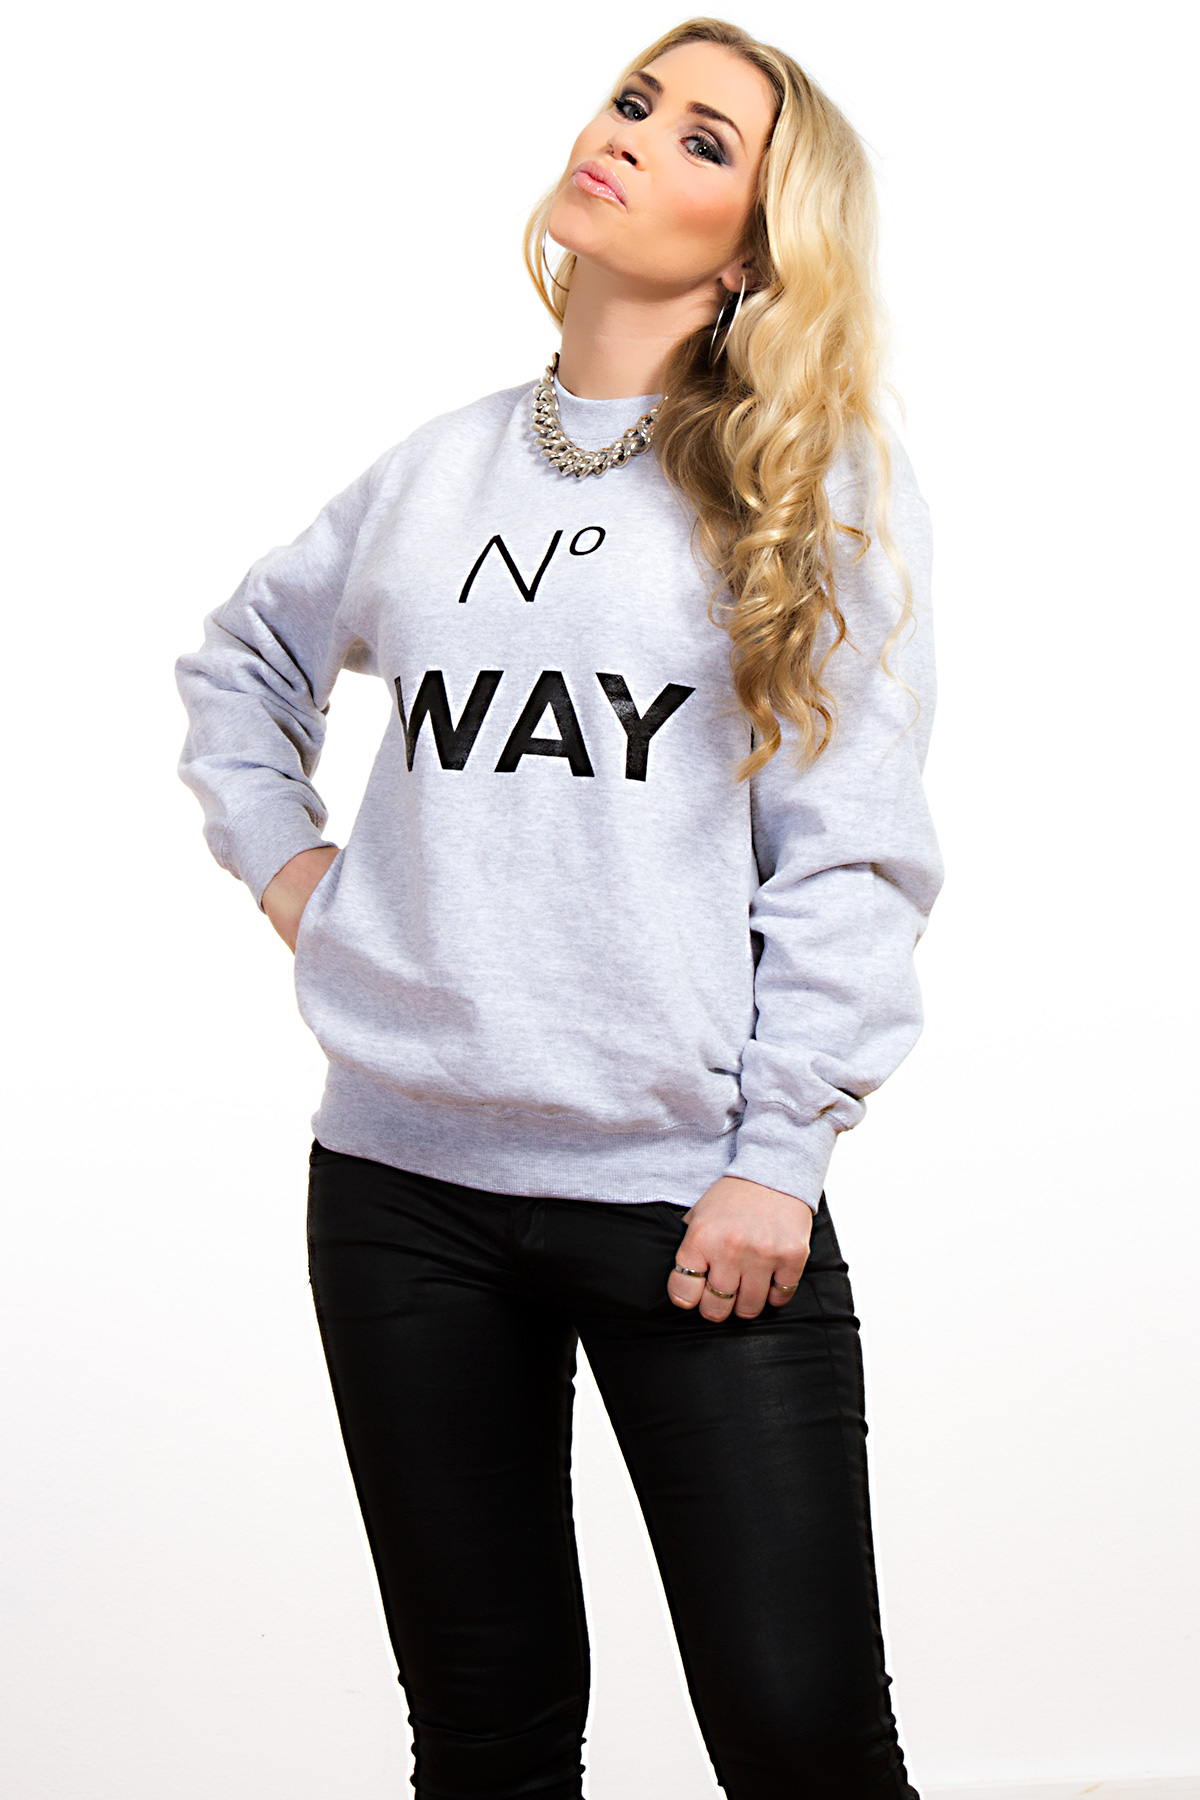 Hyori No Way Sweatshirt in Gray for Women